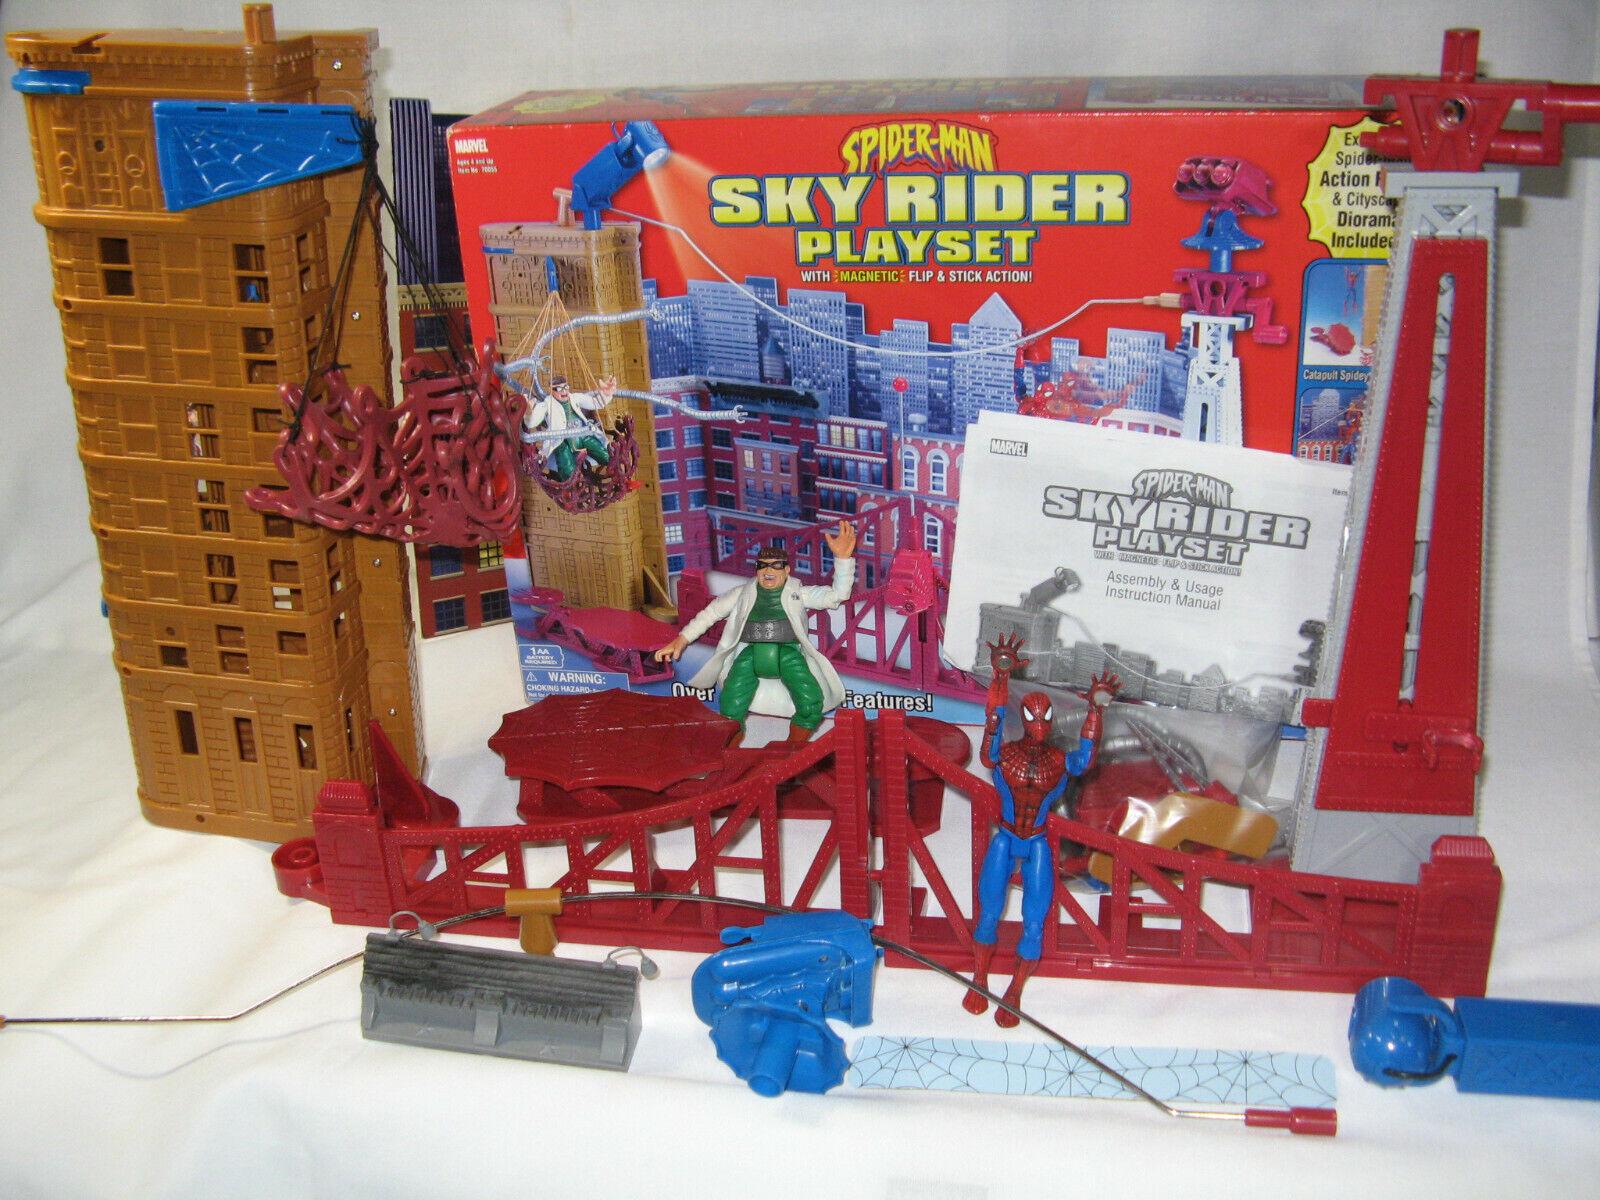 Spider-Man Sky Rider Play set.